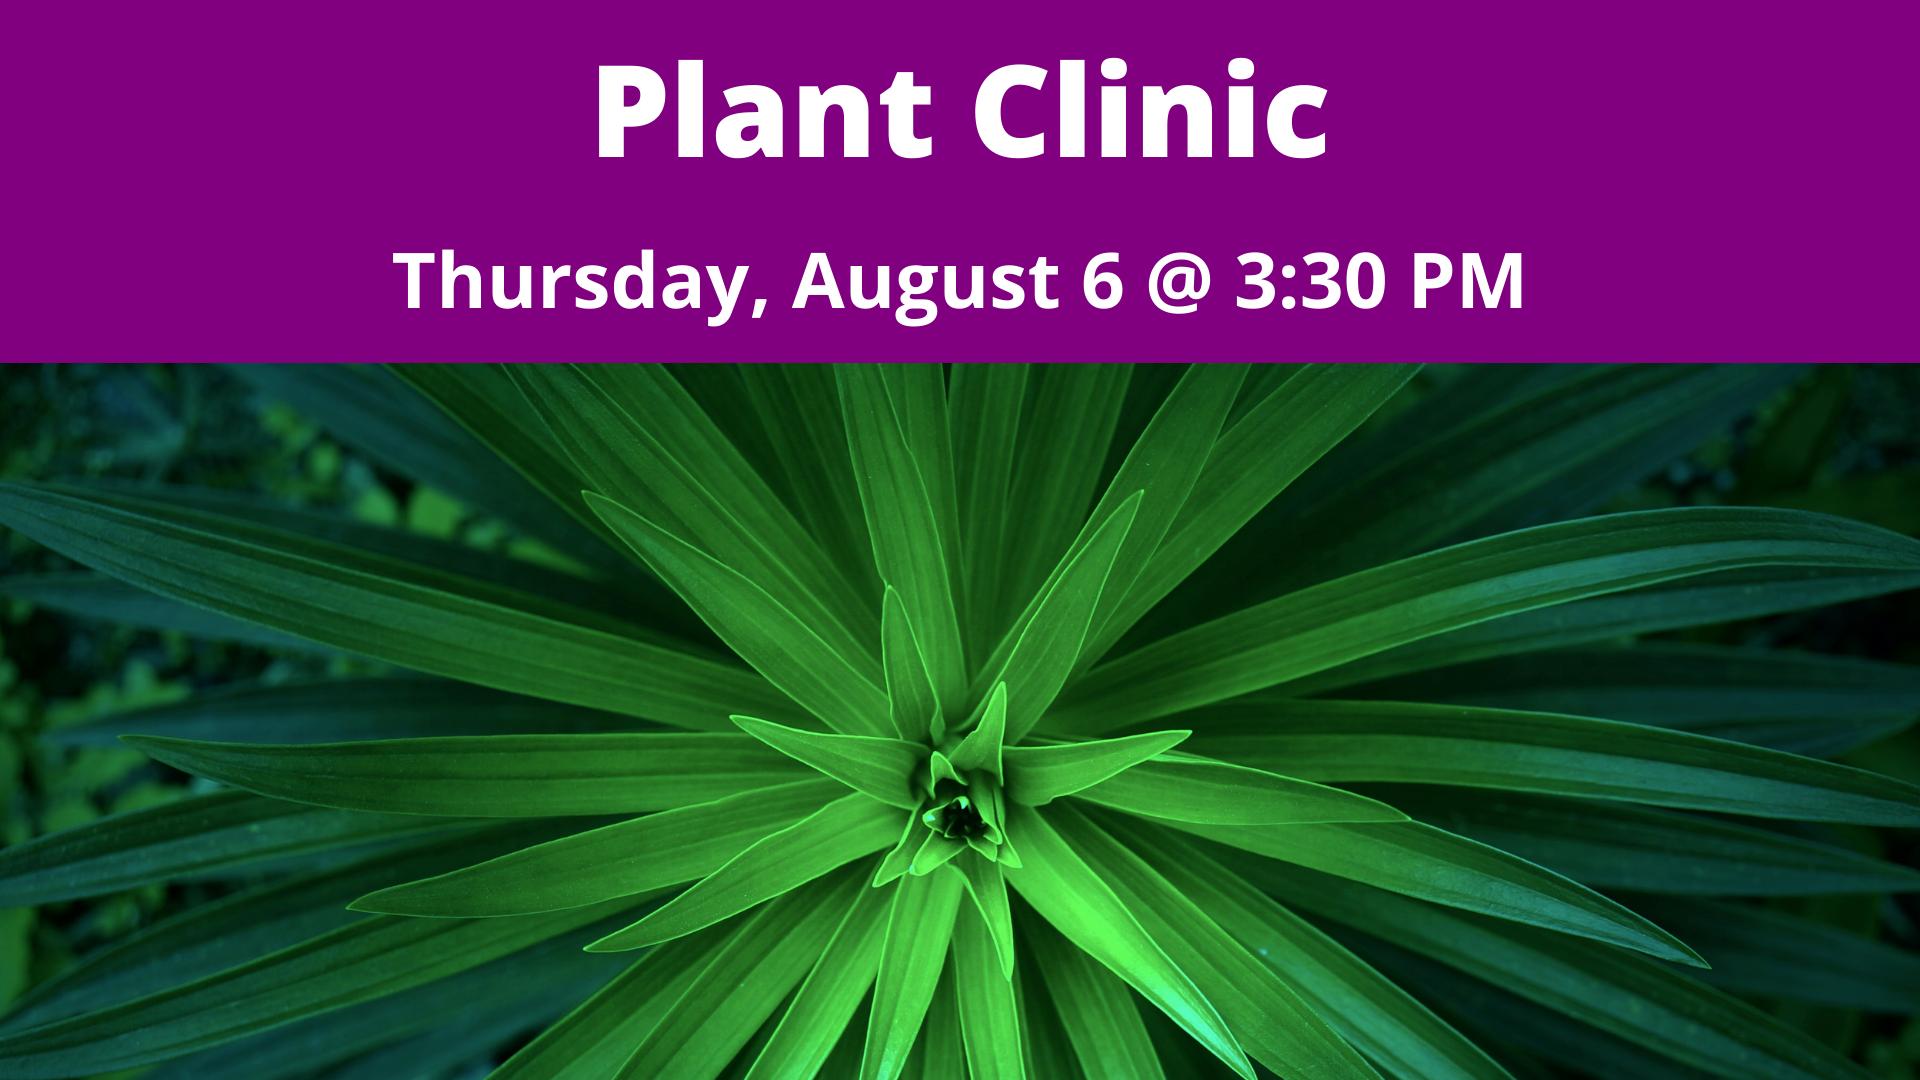 Plant Clinic with Ginny Rosenkranz